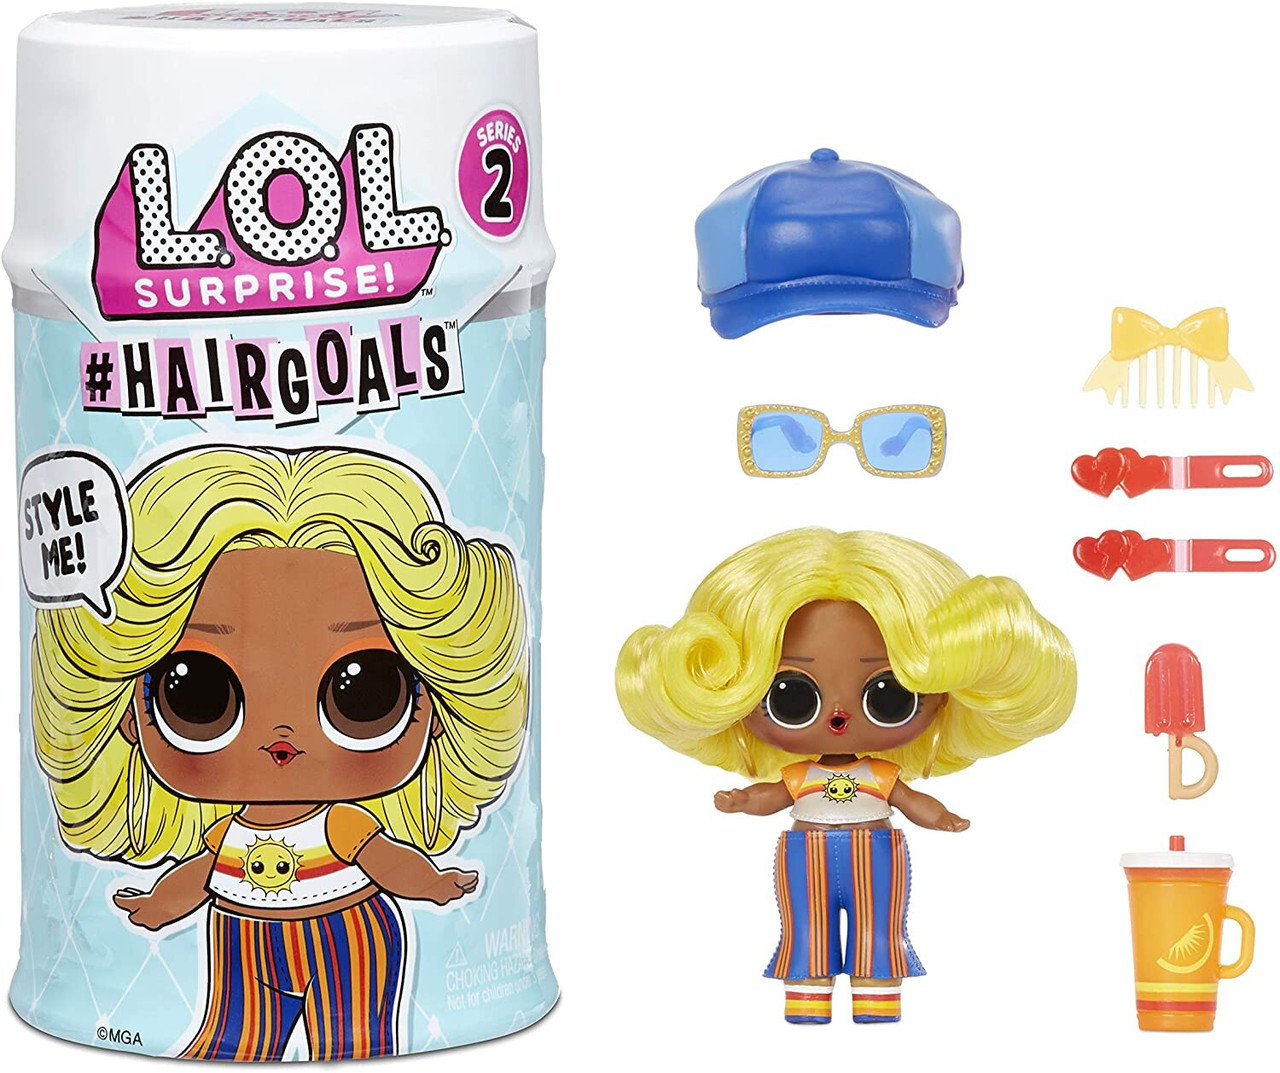 L.O.L. Surprise!! #Hairgoals Makeover Series with 15 Surprises ЛОЛ с волосами